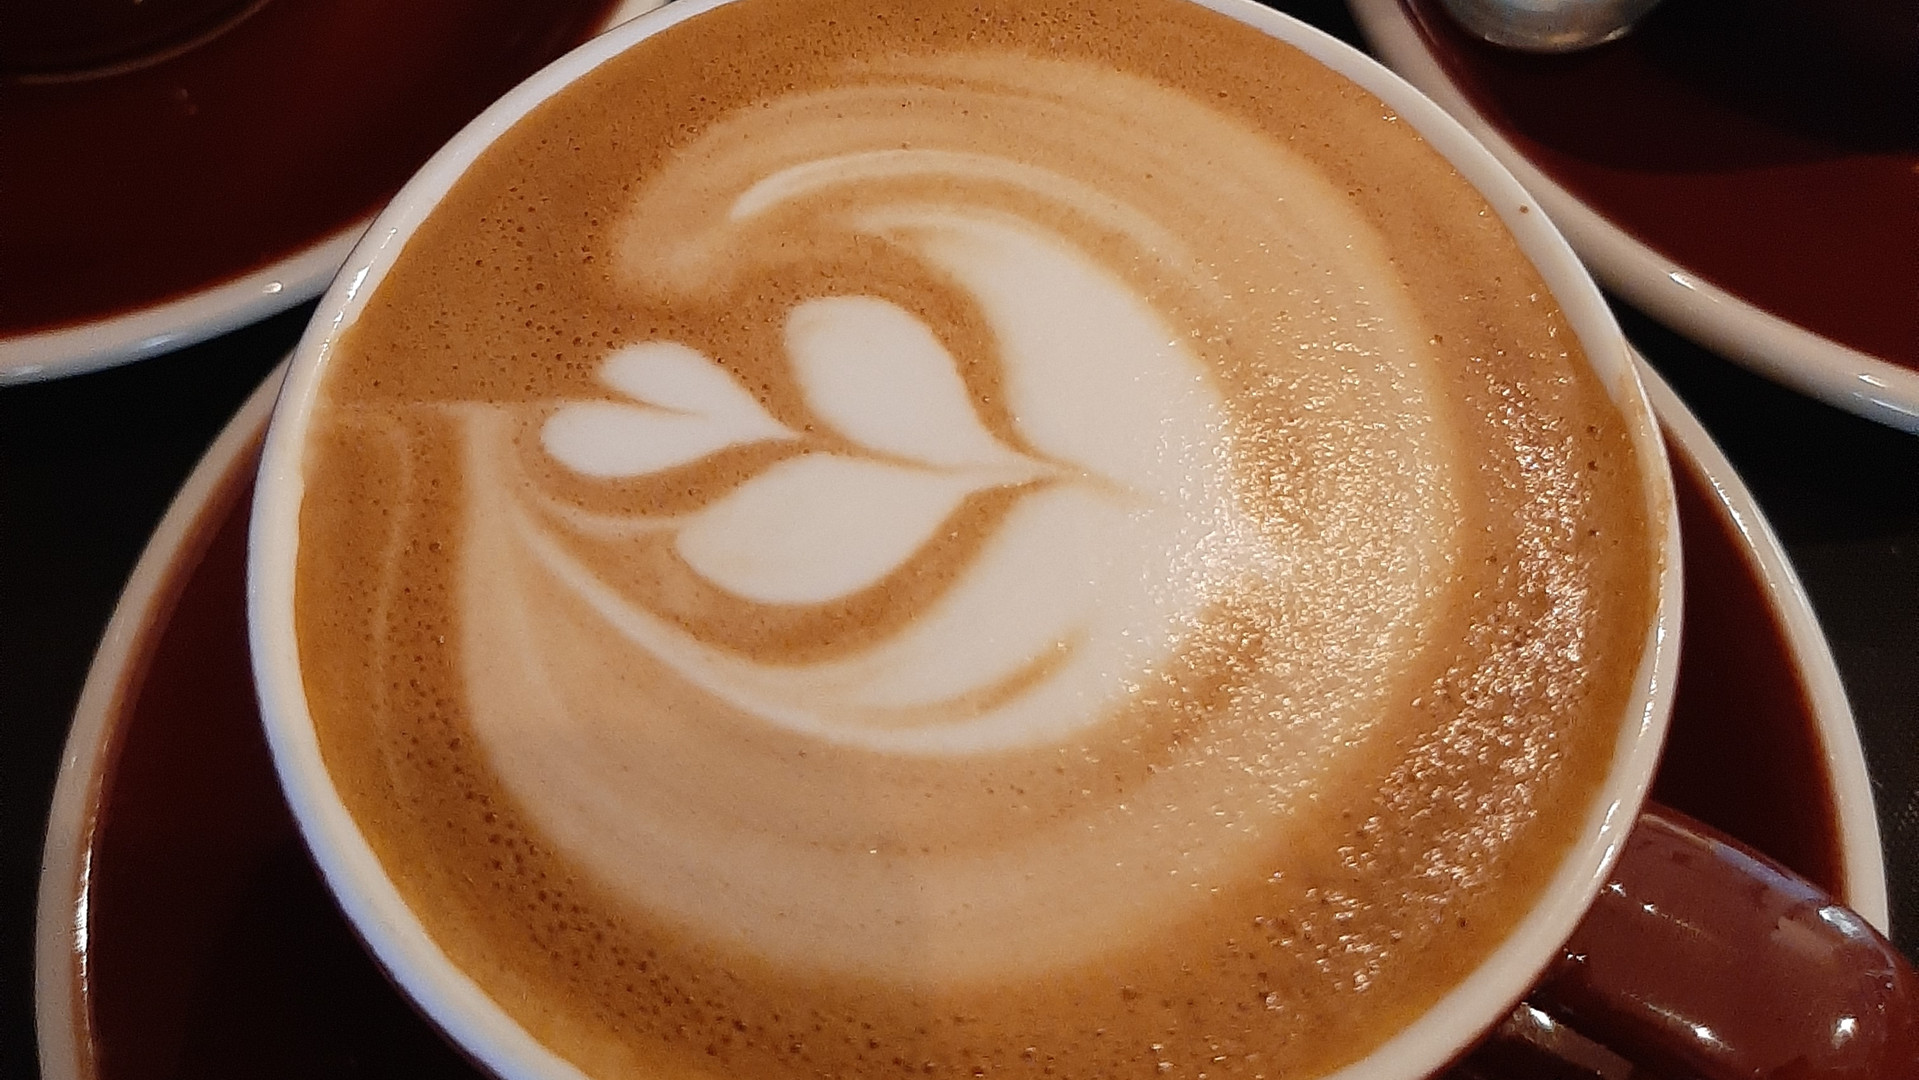 Coffee from Supreme coffee